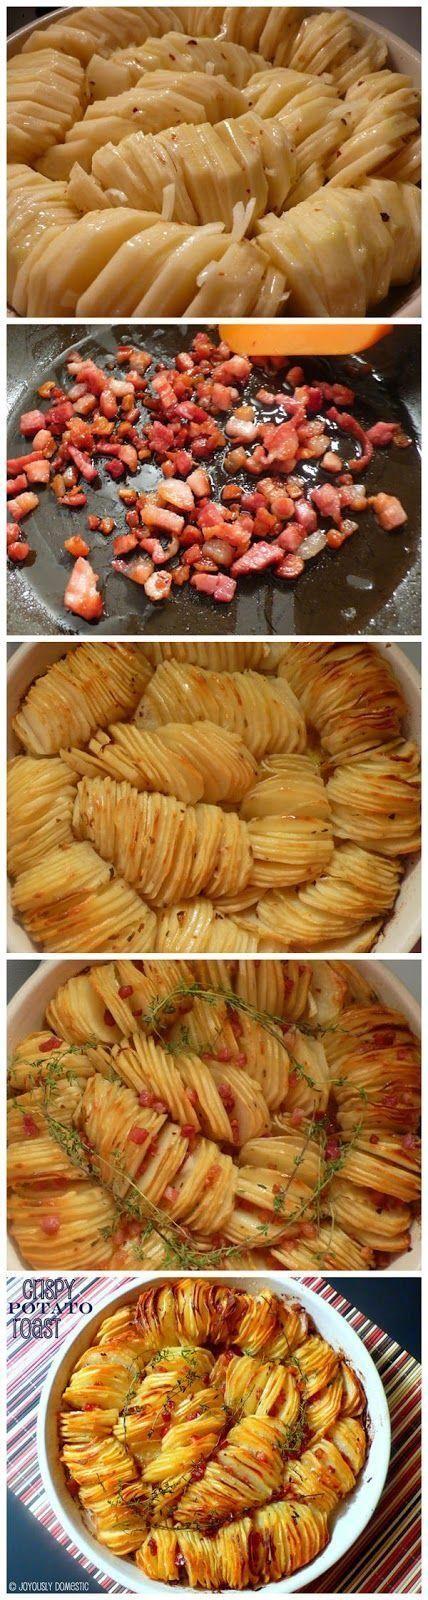 Crispy Potato Roast #potato #side